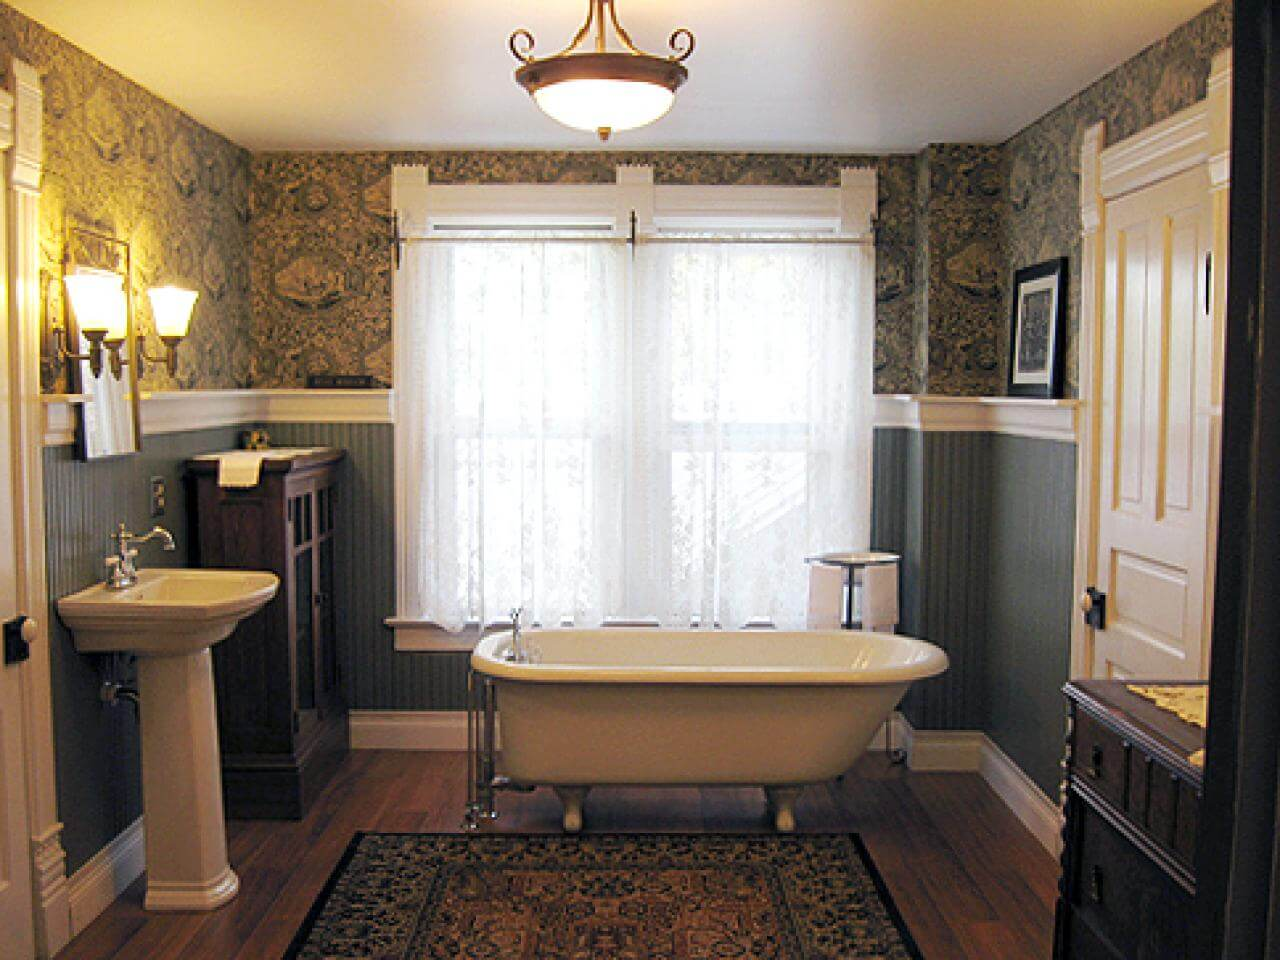 Varmt viktorianskt badrum